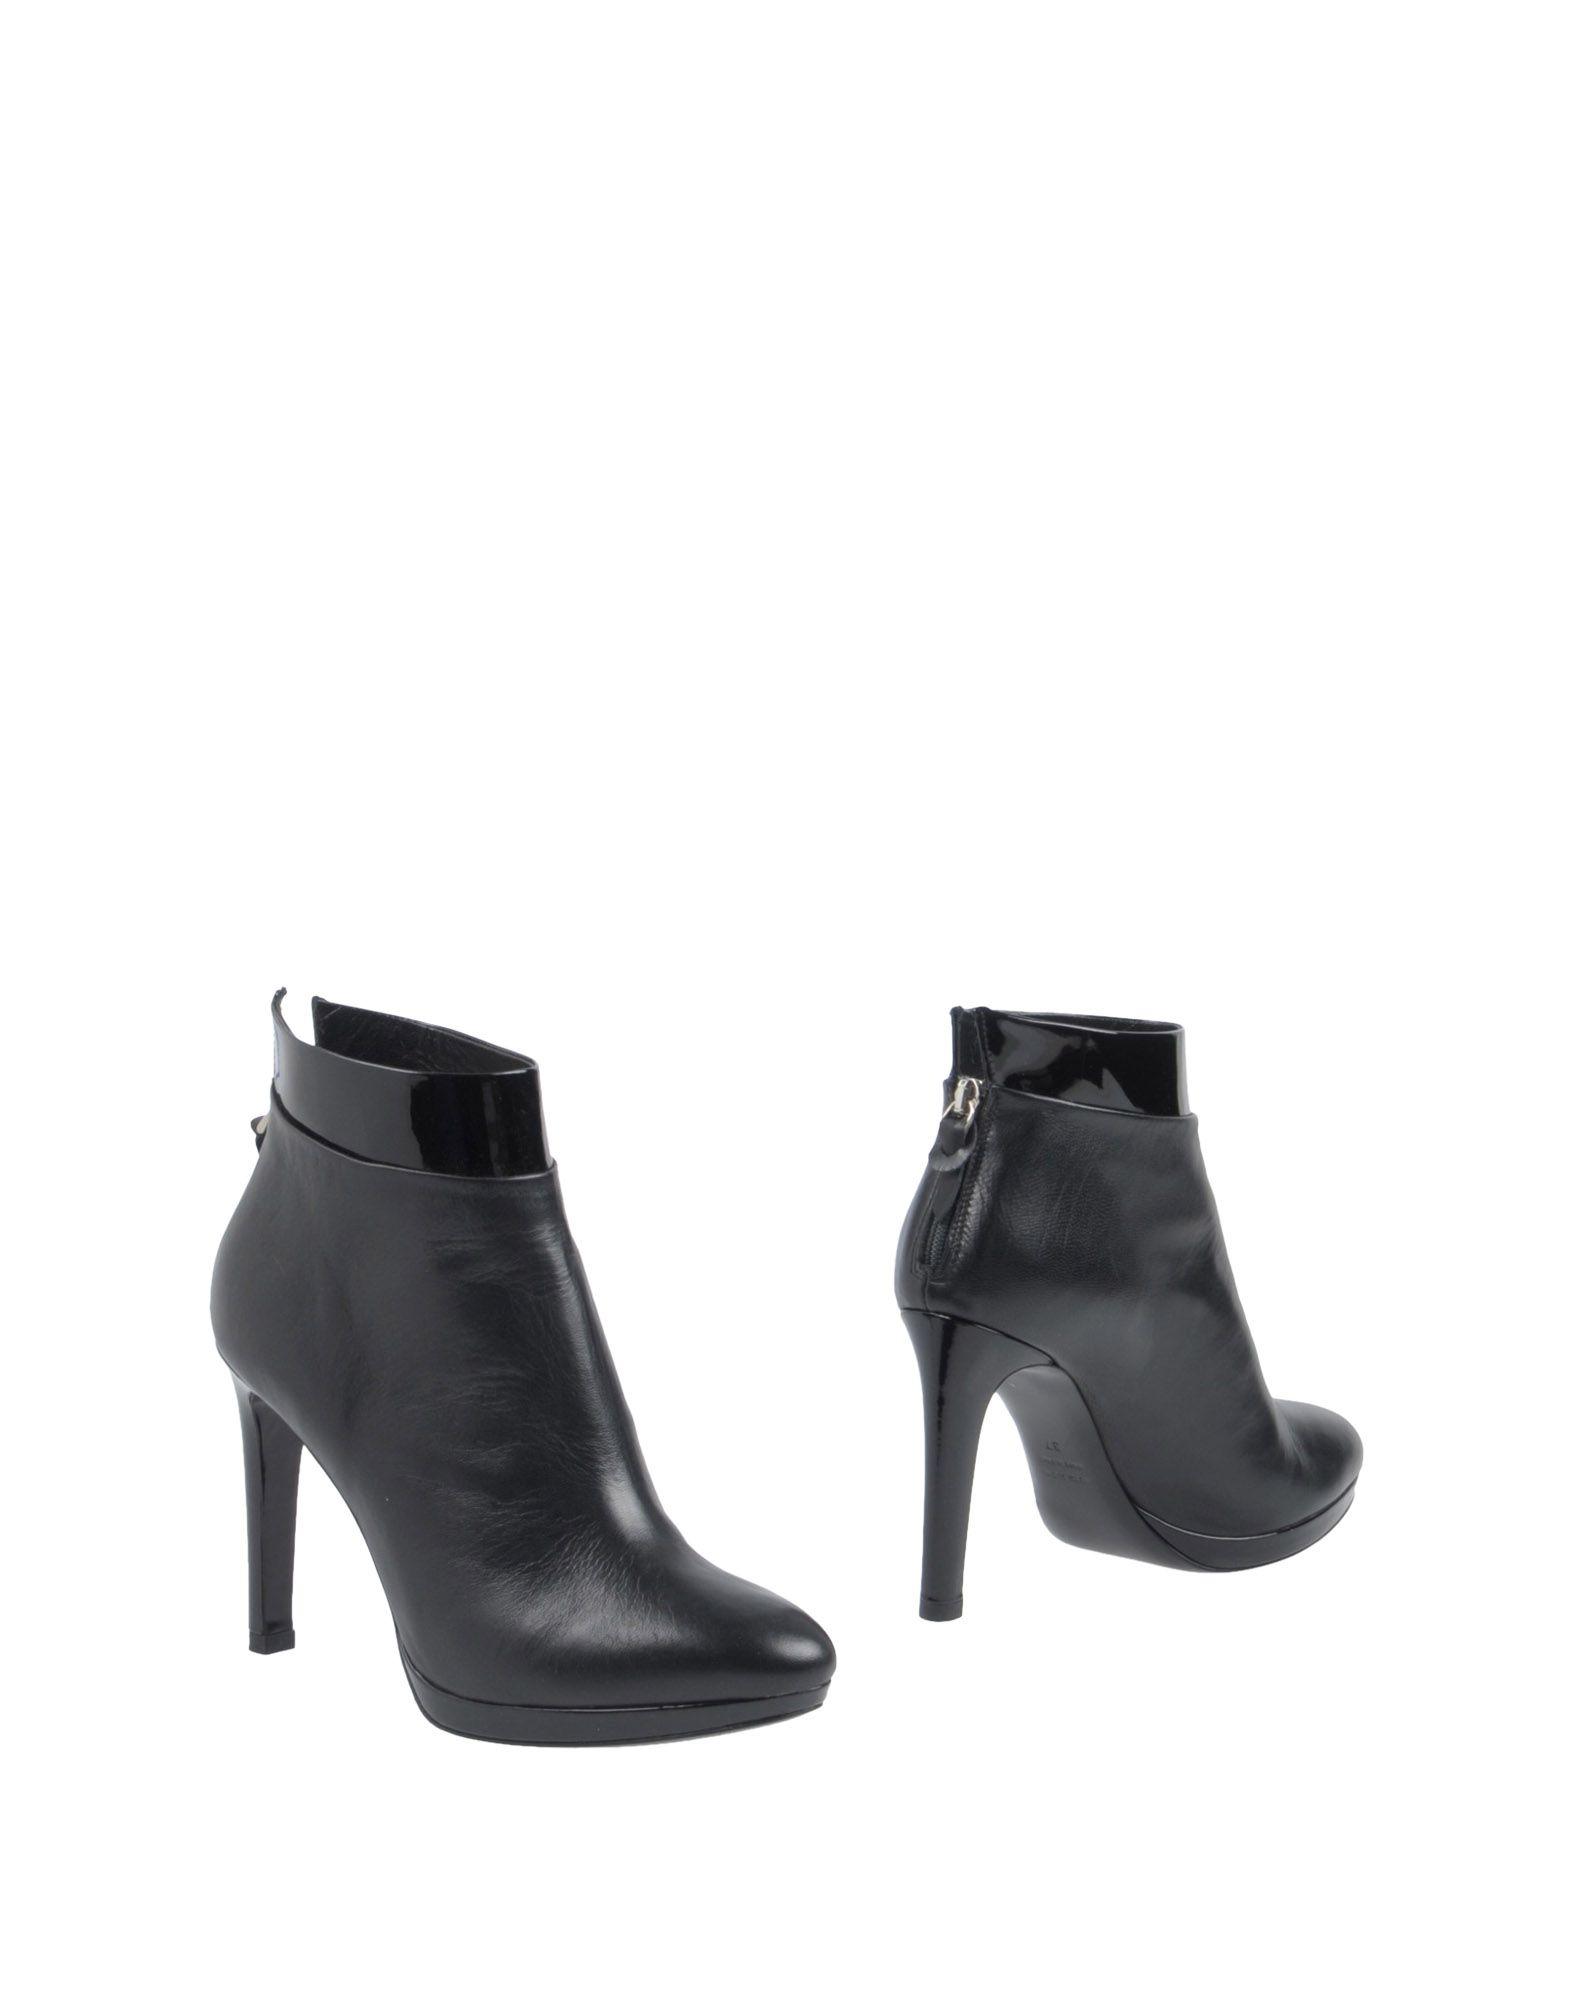 Prezioso Ankle Boot Boots - Women Prezioso Ankle Boots Boot online on  United Kingdom - 11449869SC 66ebc5